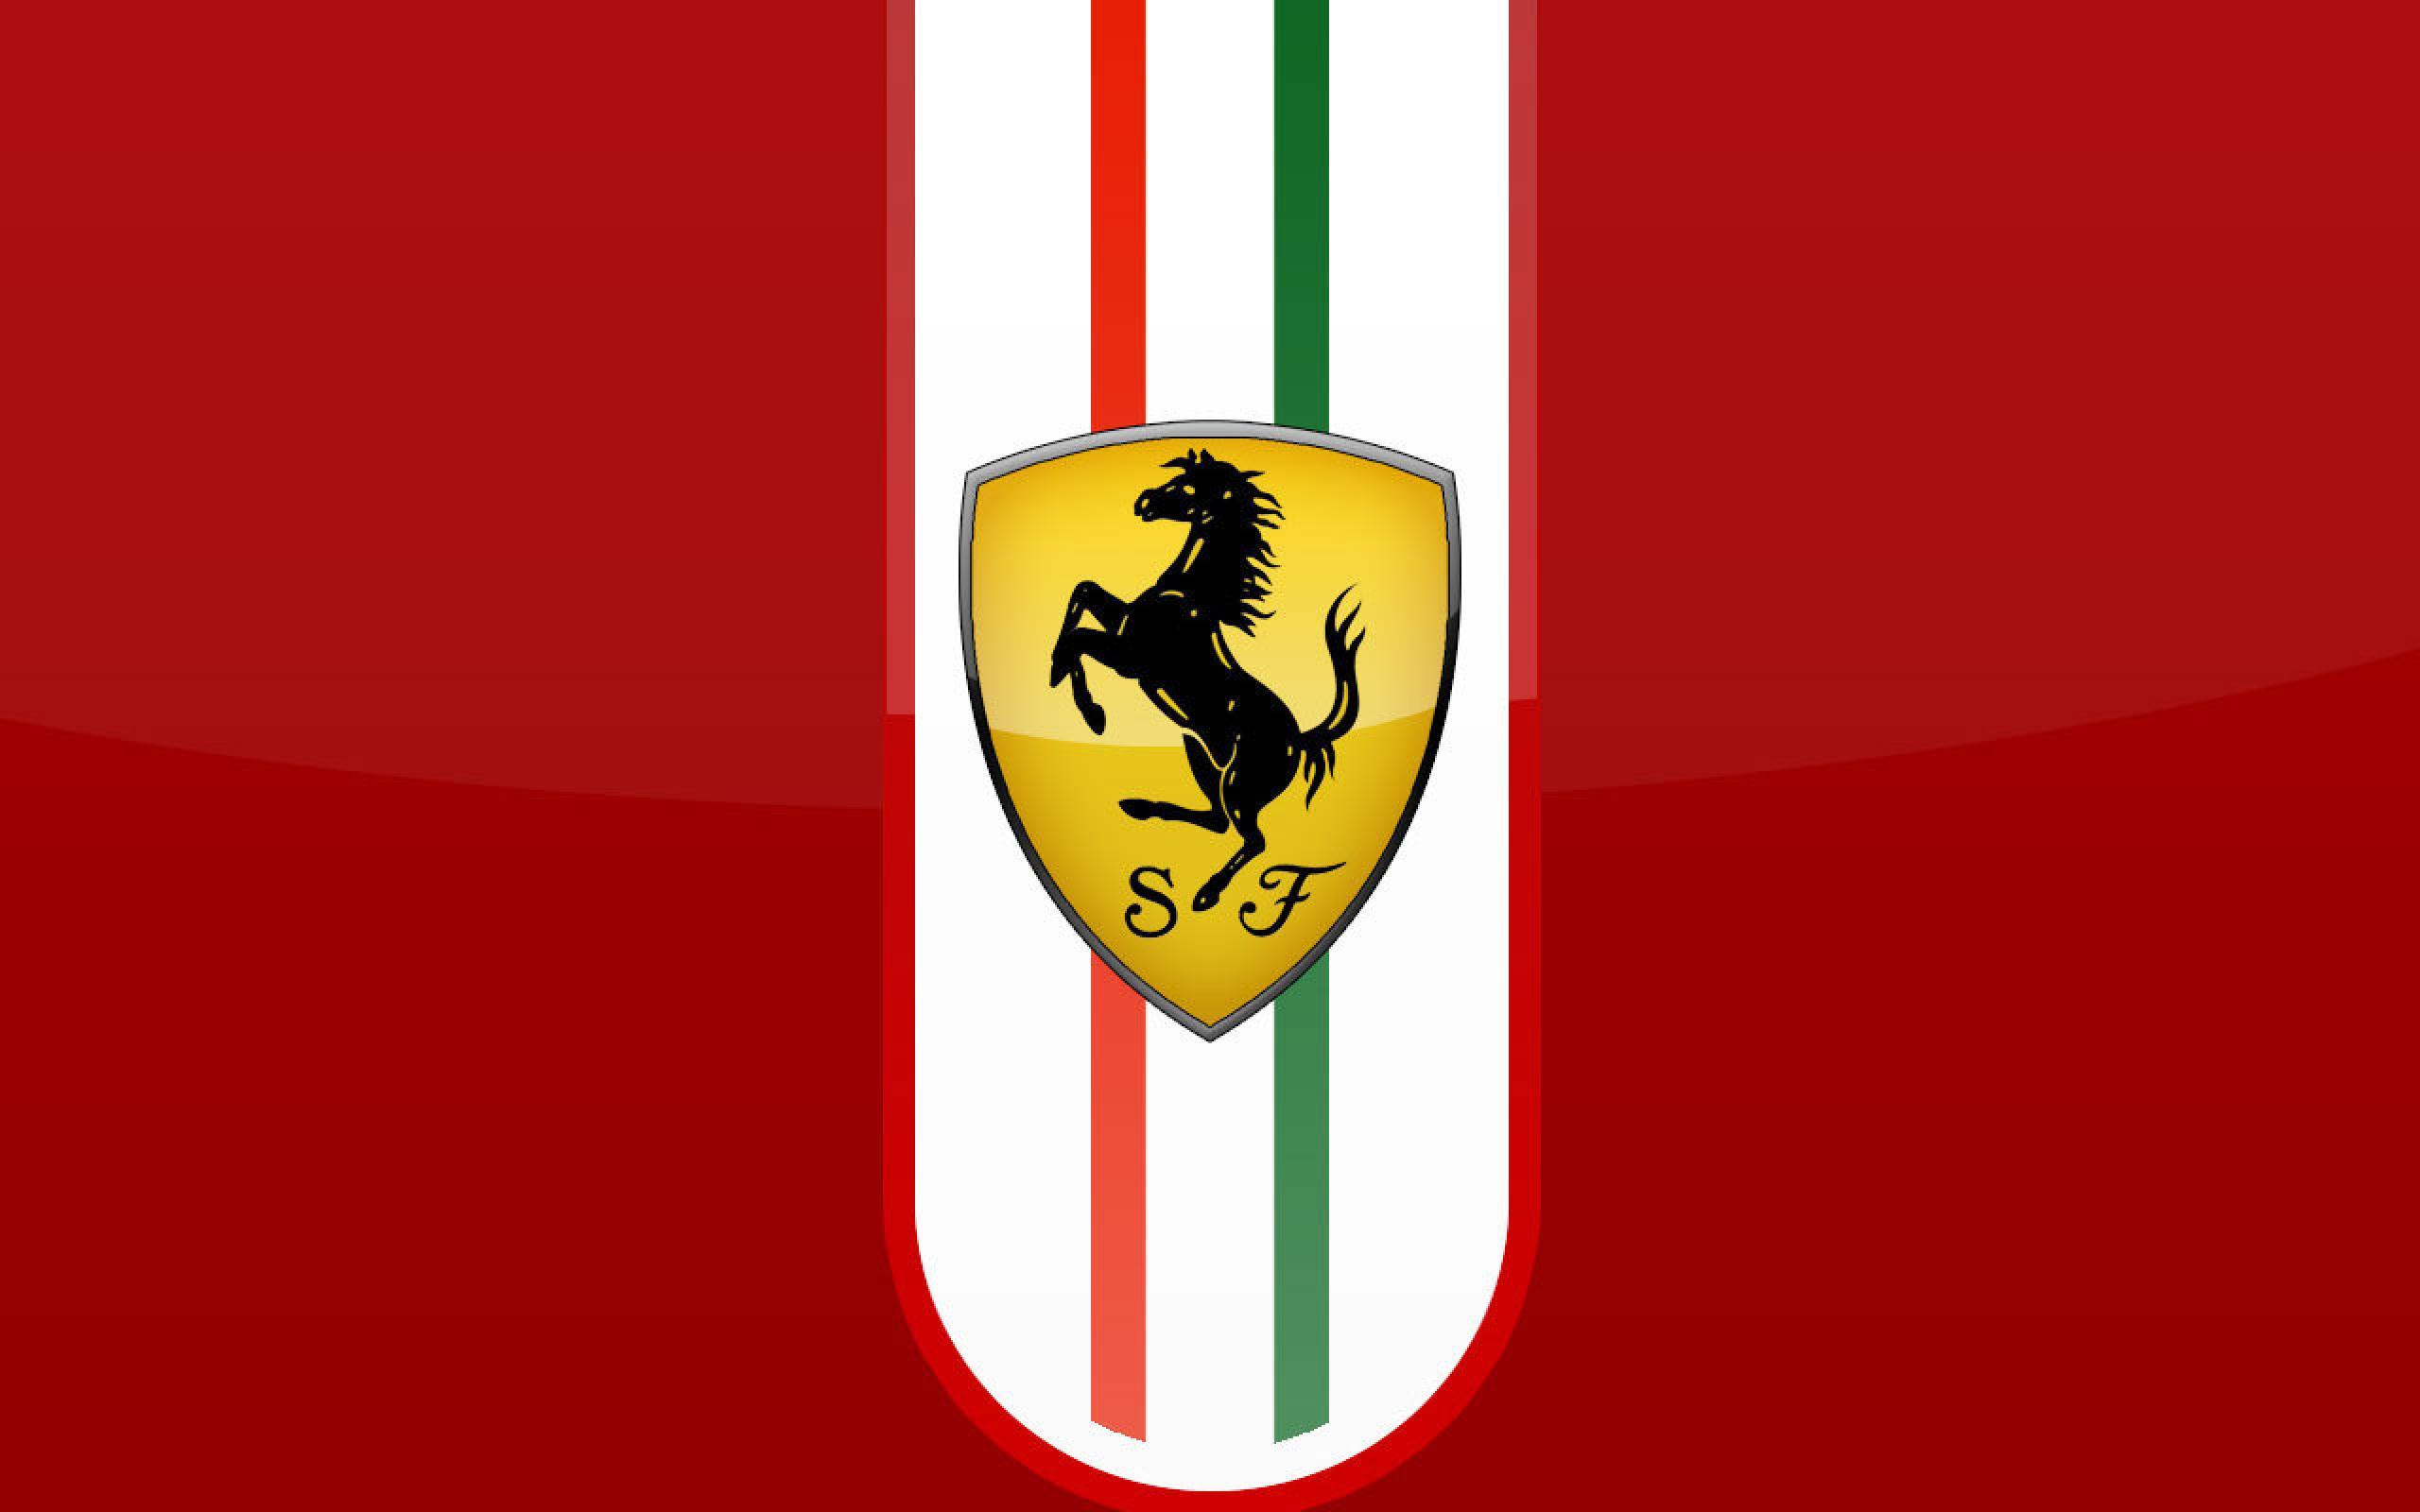 wallpapers ferrari logo - photo #3